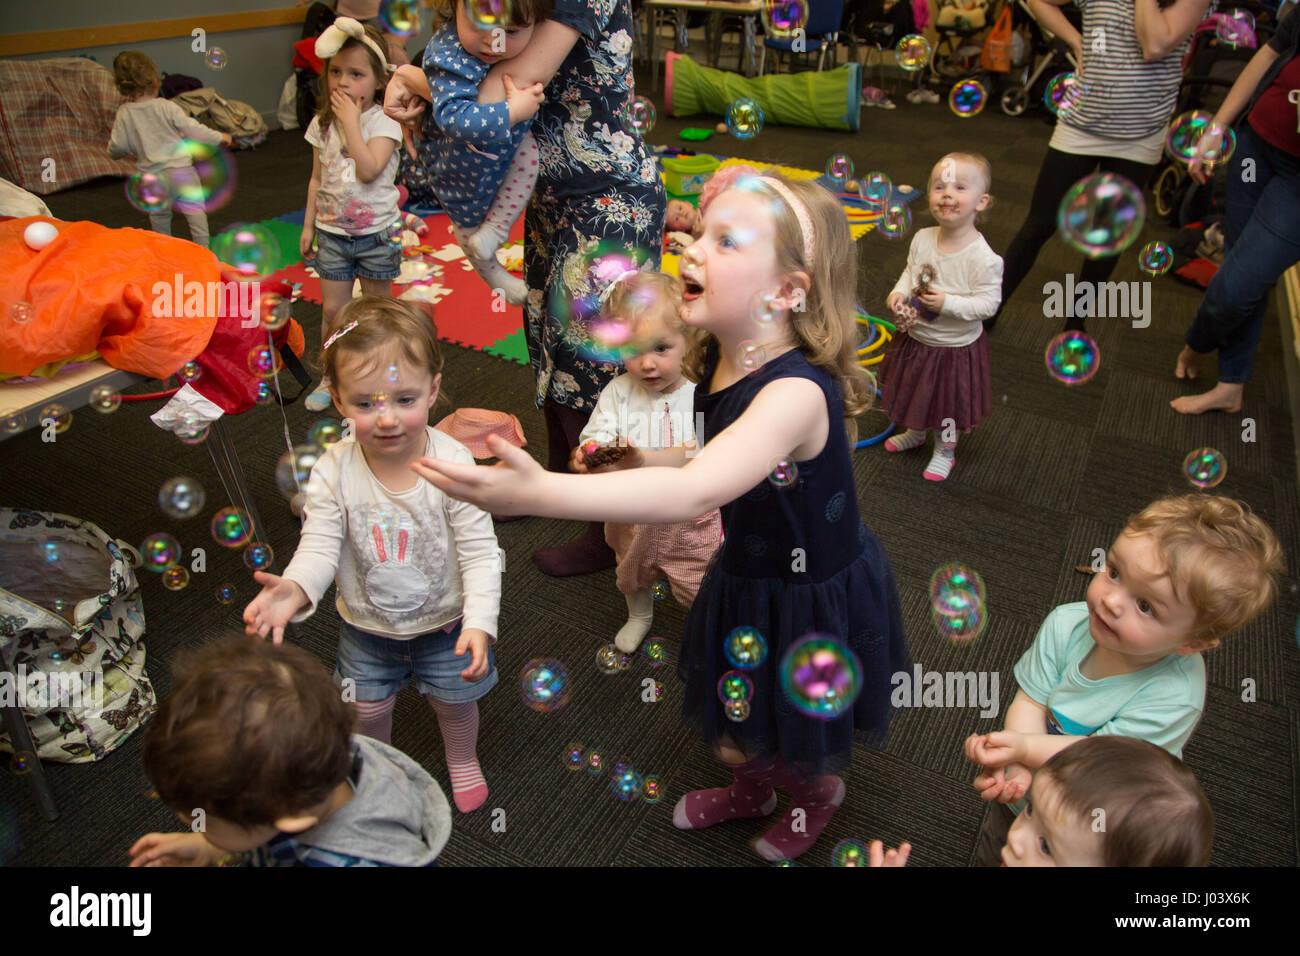 Baby & Toddler sign language class - Stock Image